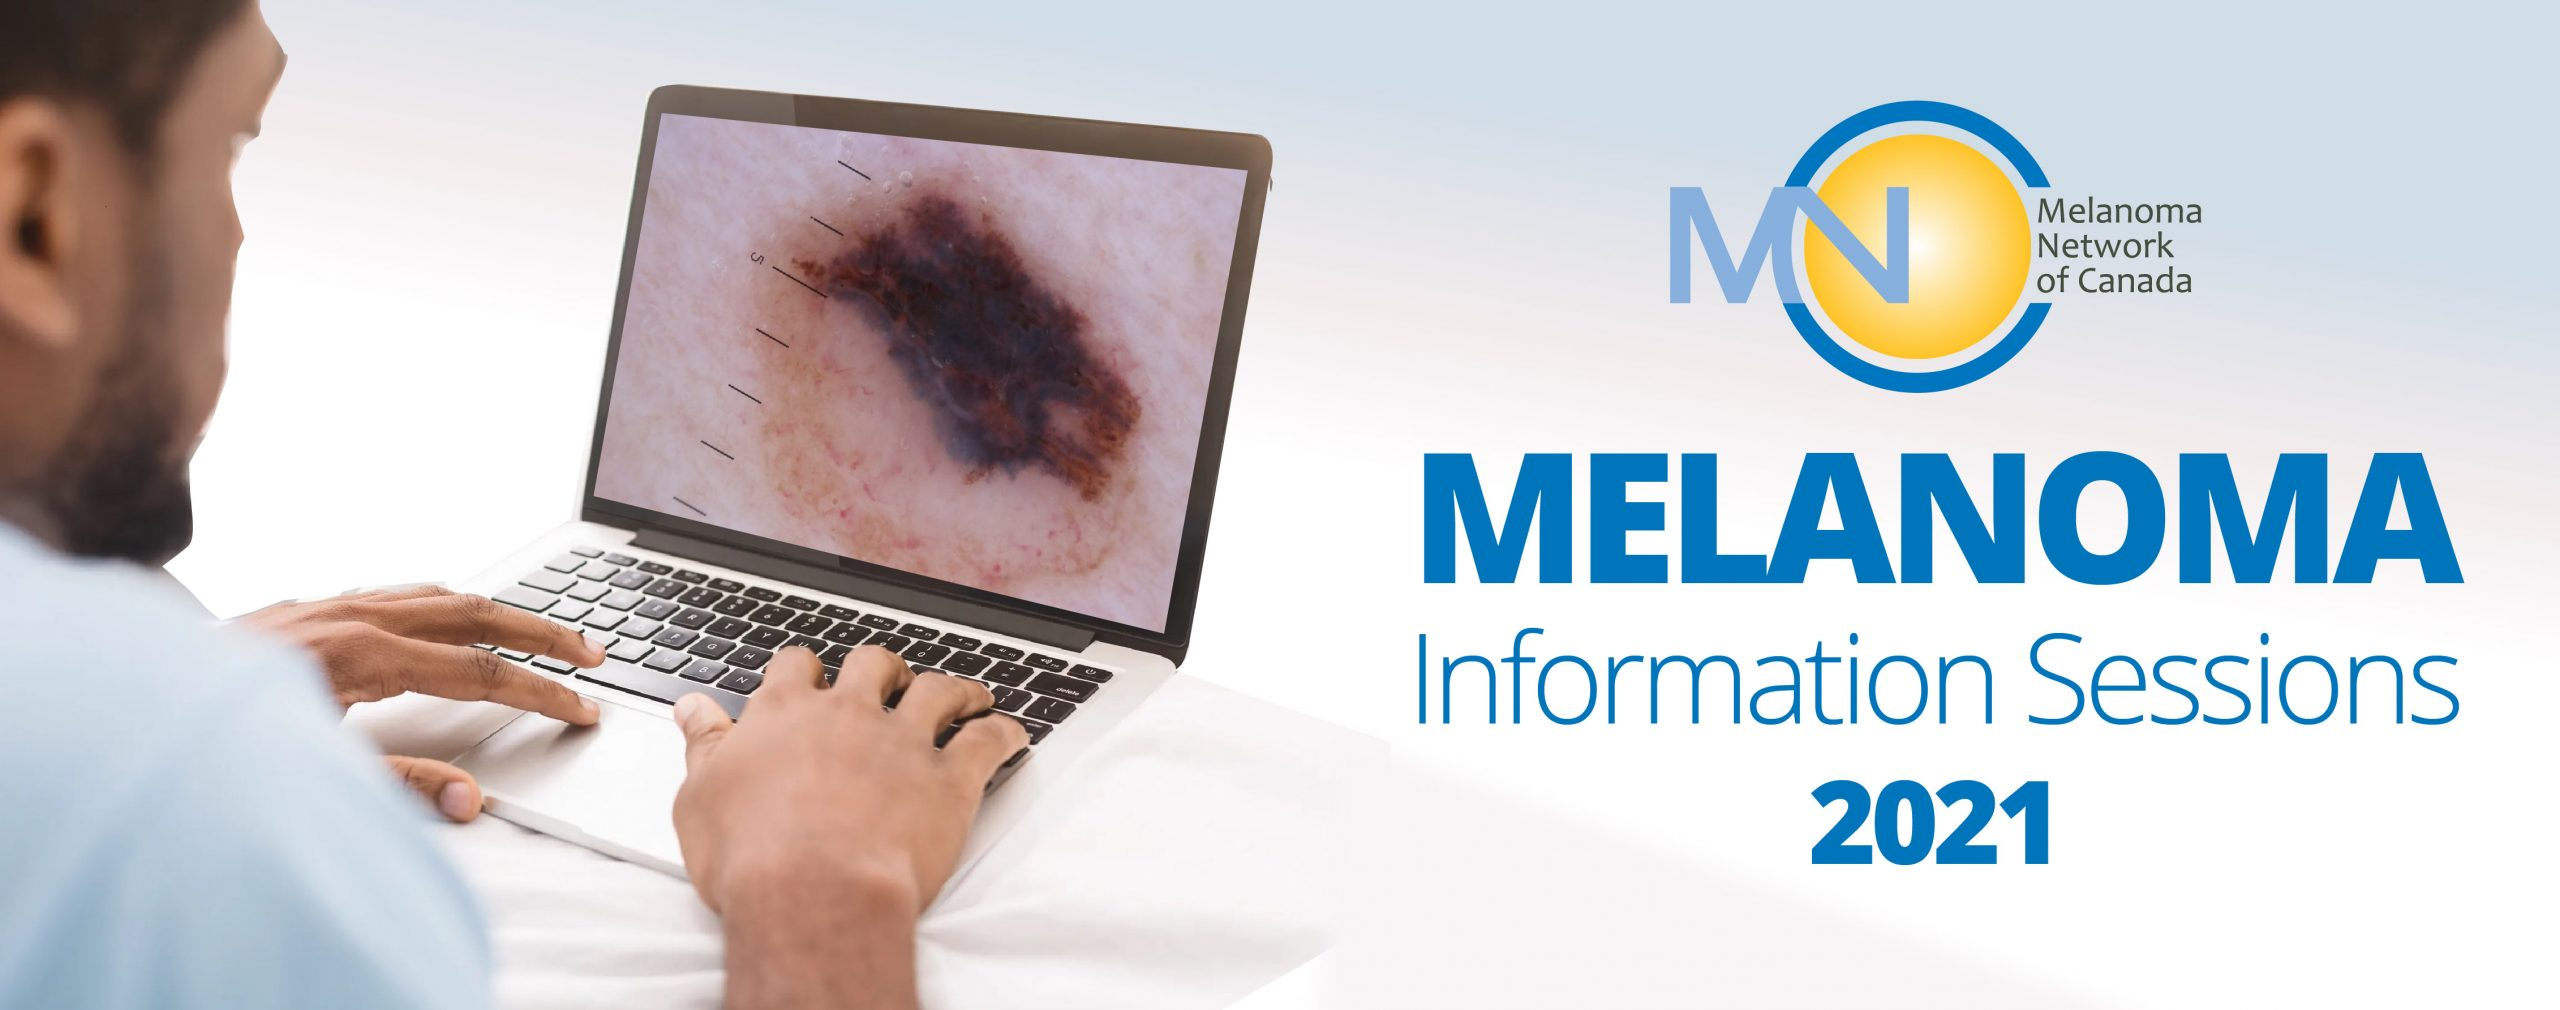 Melanoma Information Sessions